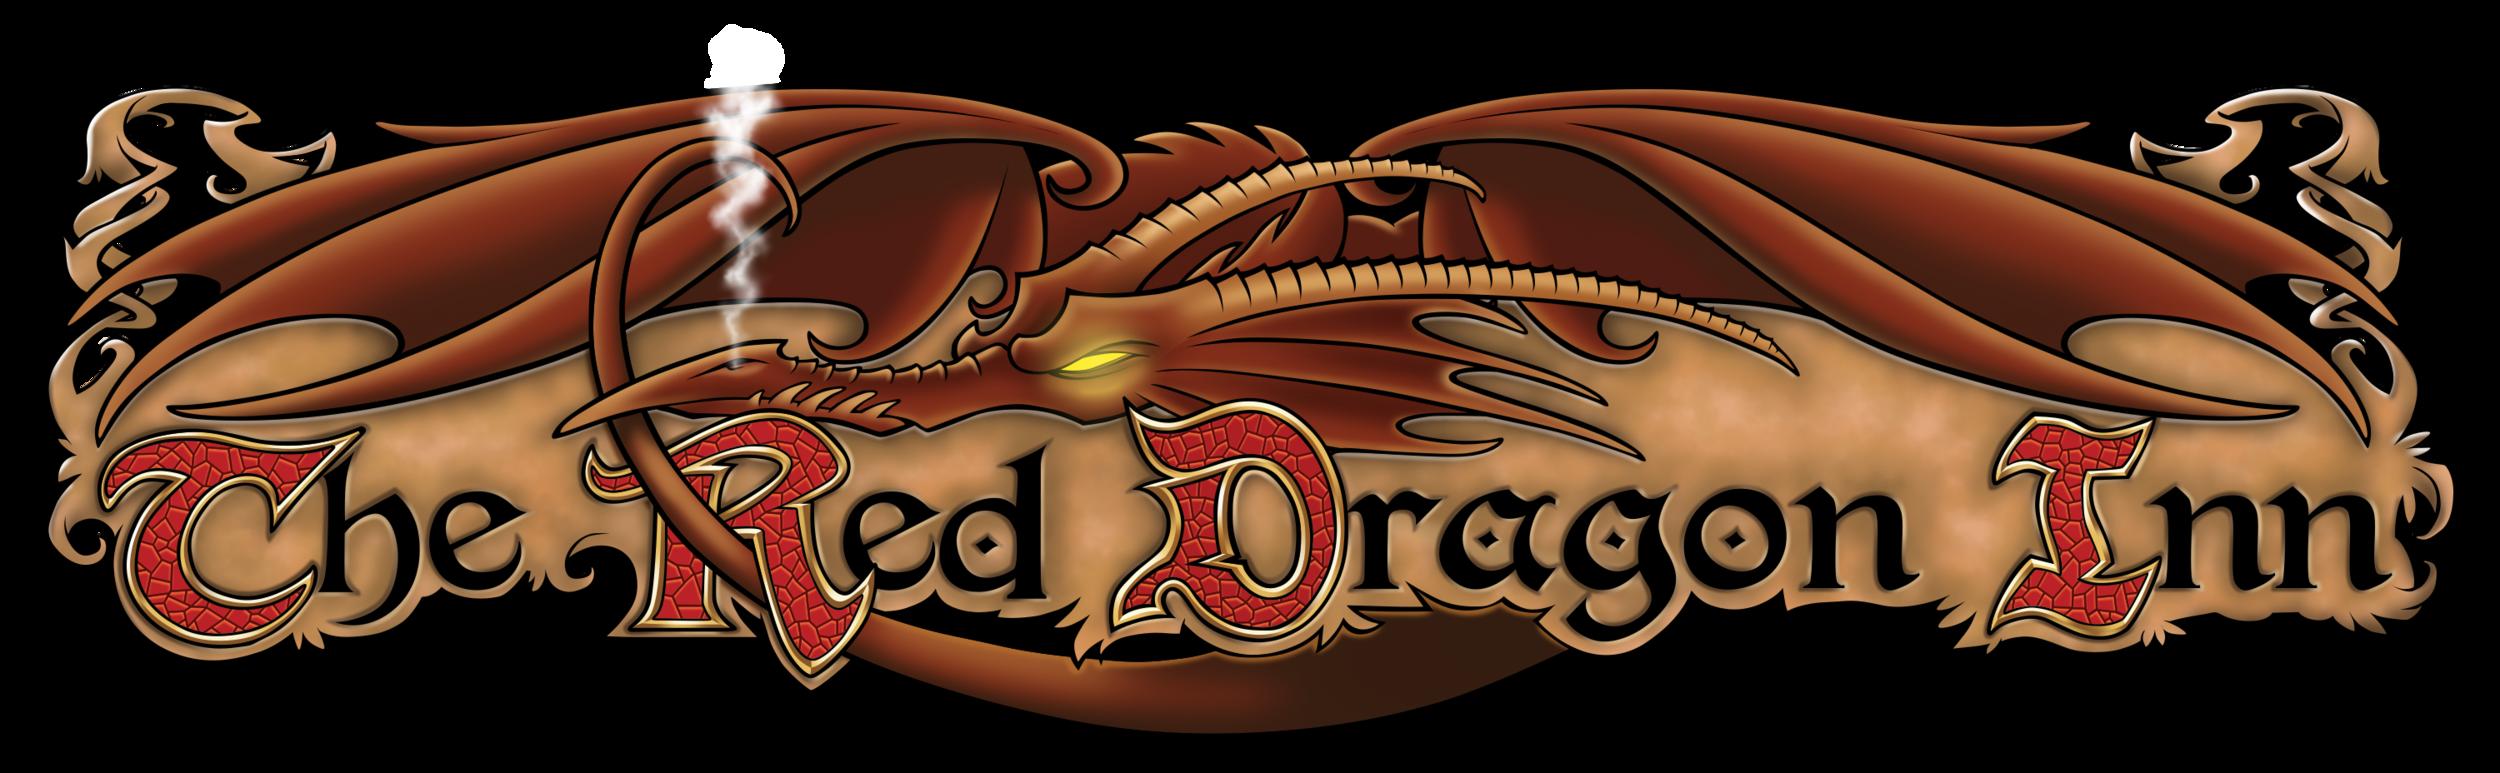 RedDragonInn_Logo - Jeff Morrow.png